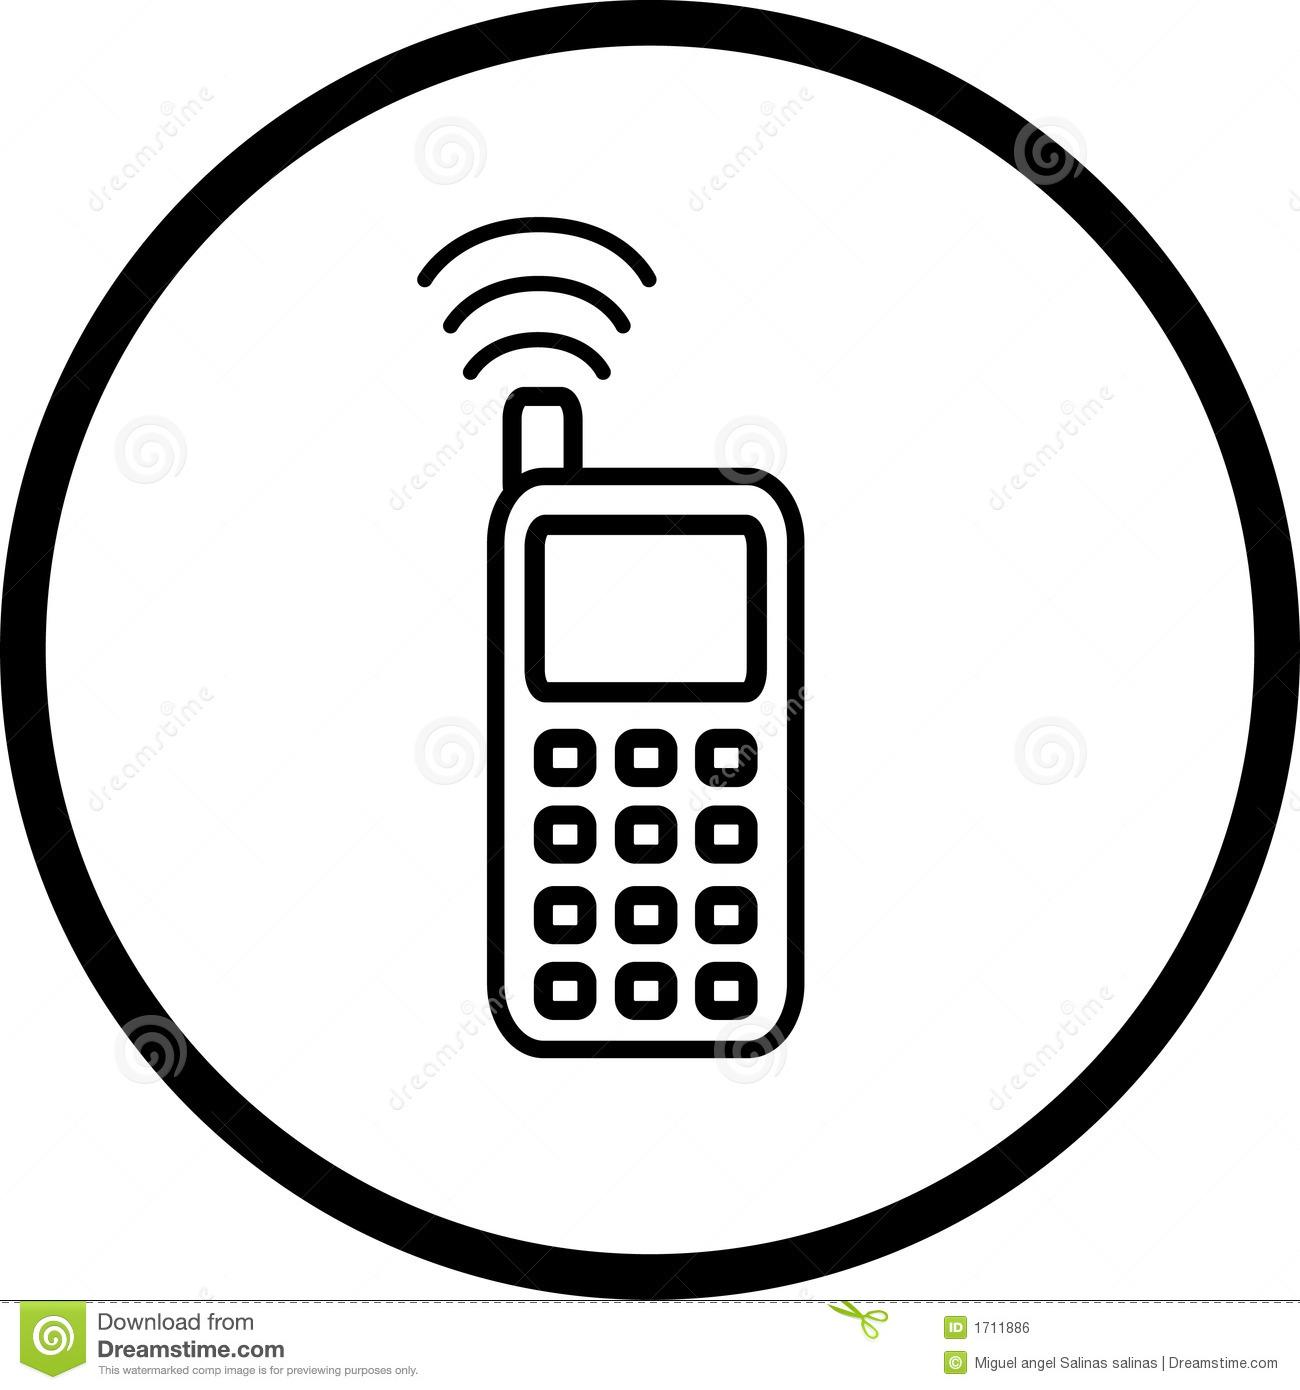 Symbole de t l phone portable 1711886